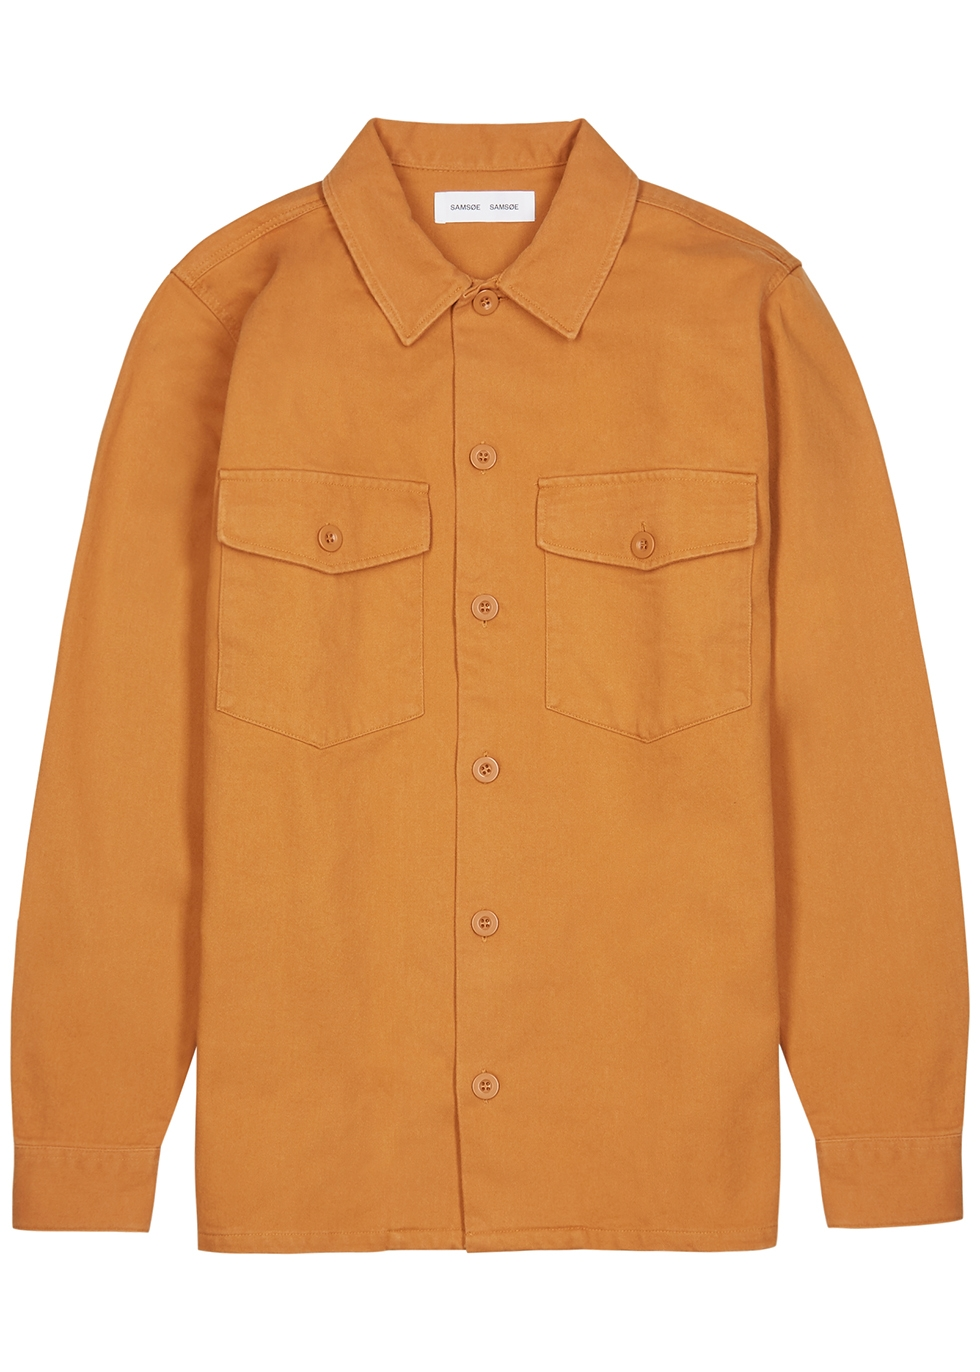 Luccas orange cotton overshirt